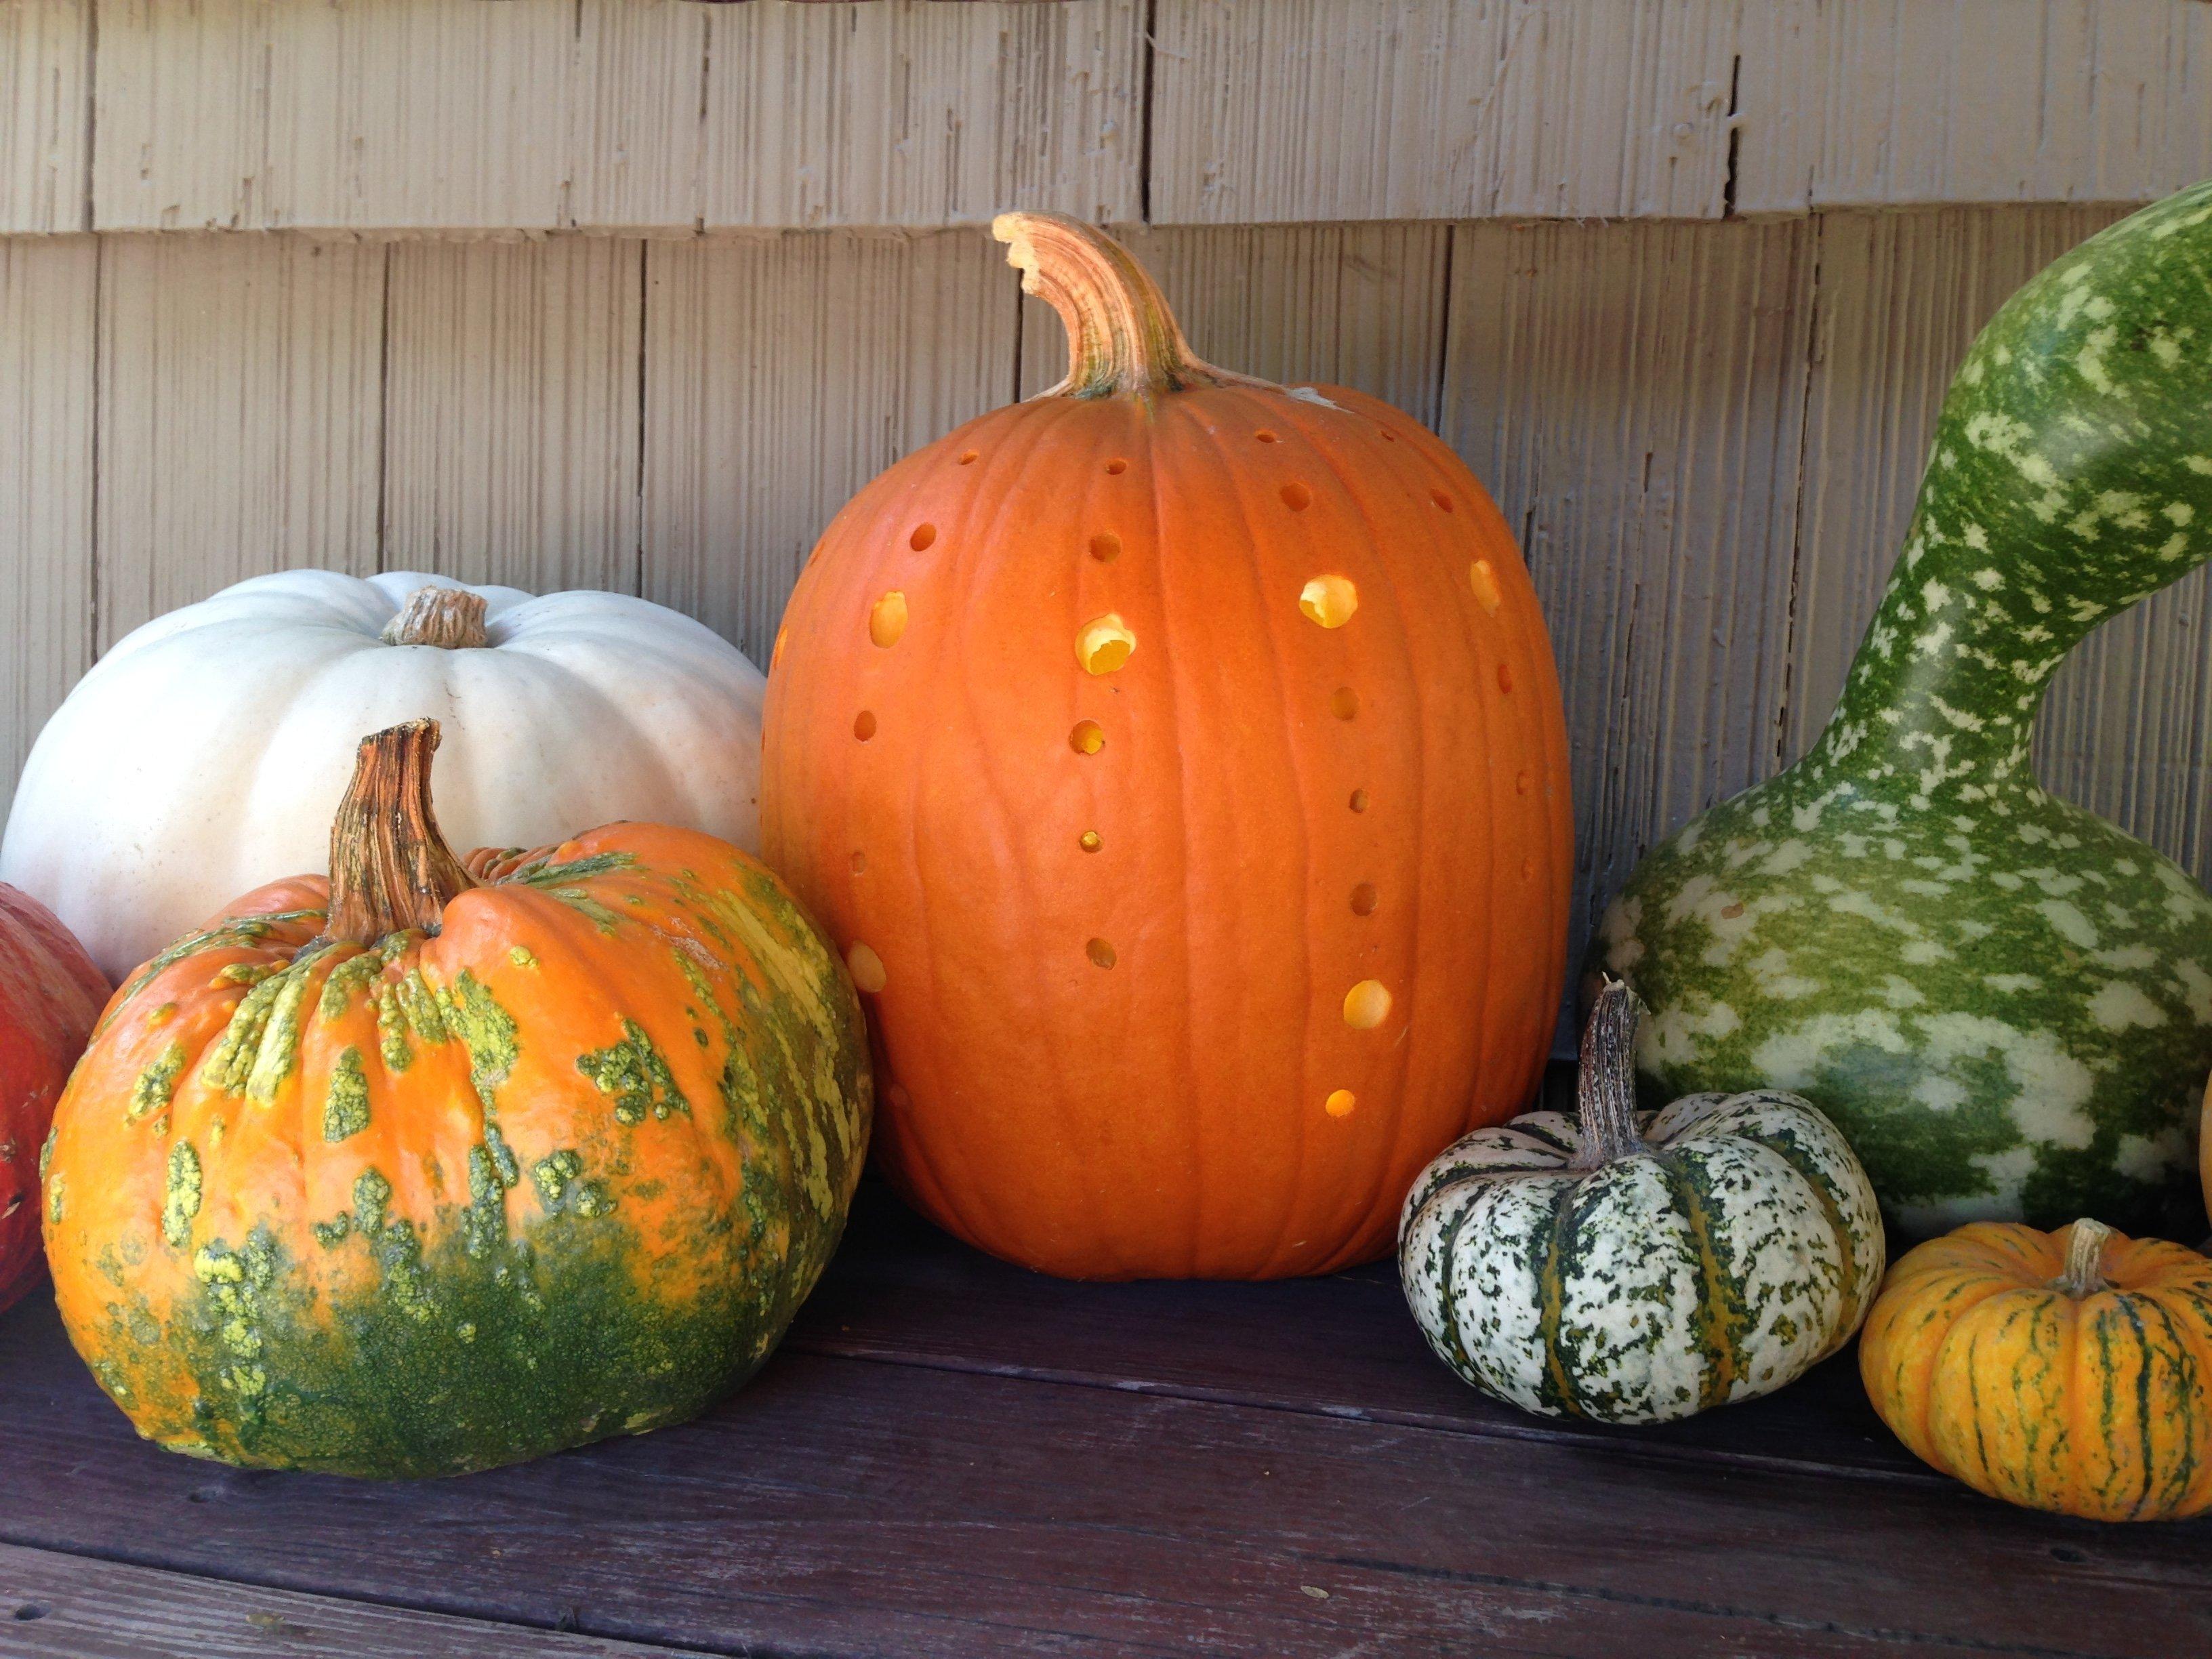 10 Stylish Creative Jack O Lantern Ideas pumpkins power drills 10 creative jack o lantern ideas 2020